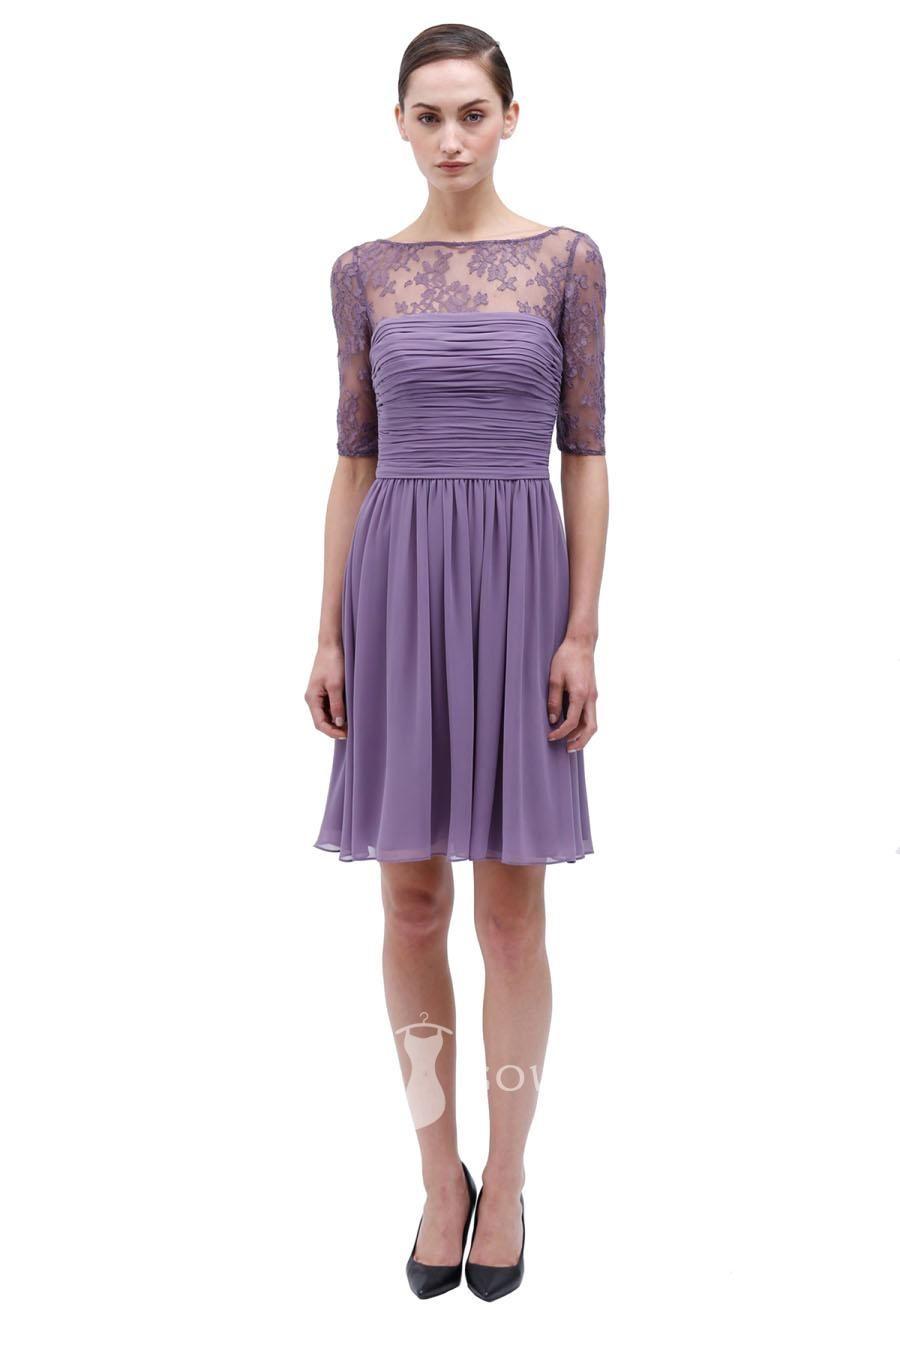 violet bateau neck lace and chiffon half sleeve bridesmaid dress ...